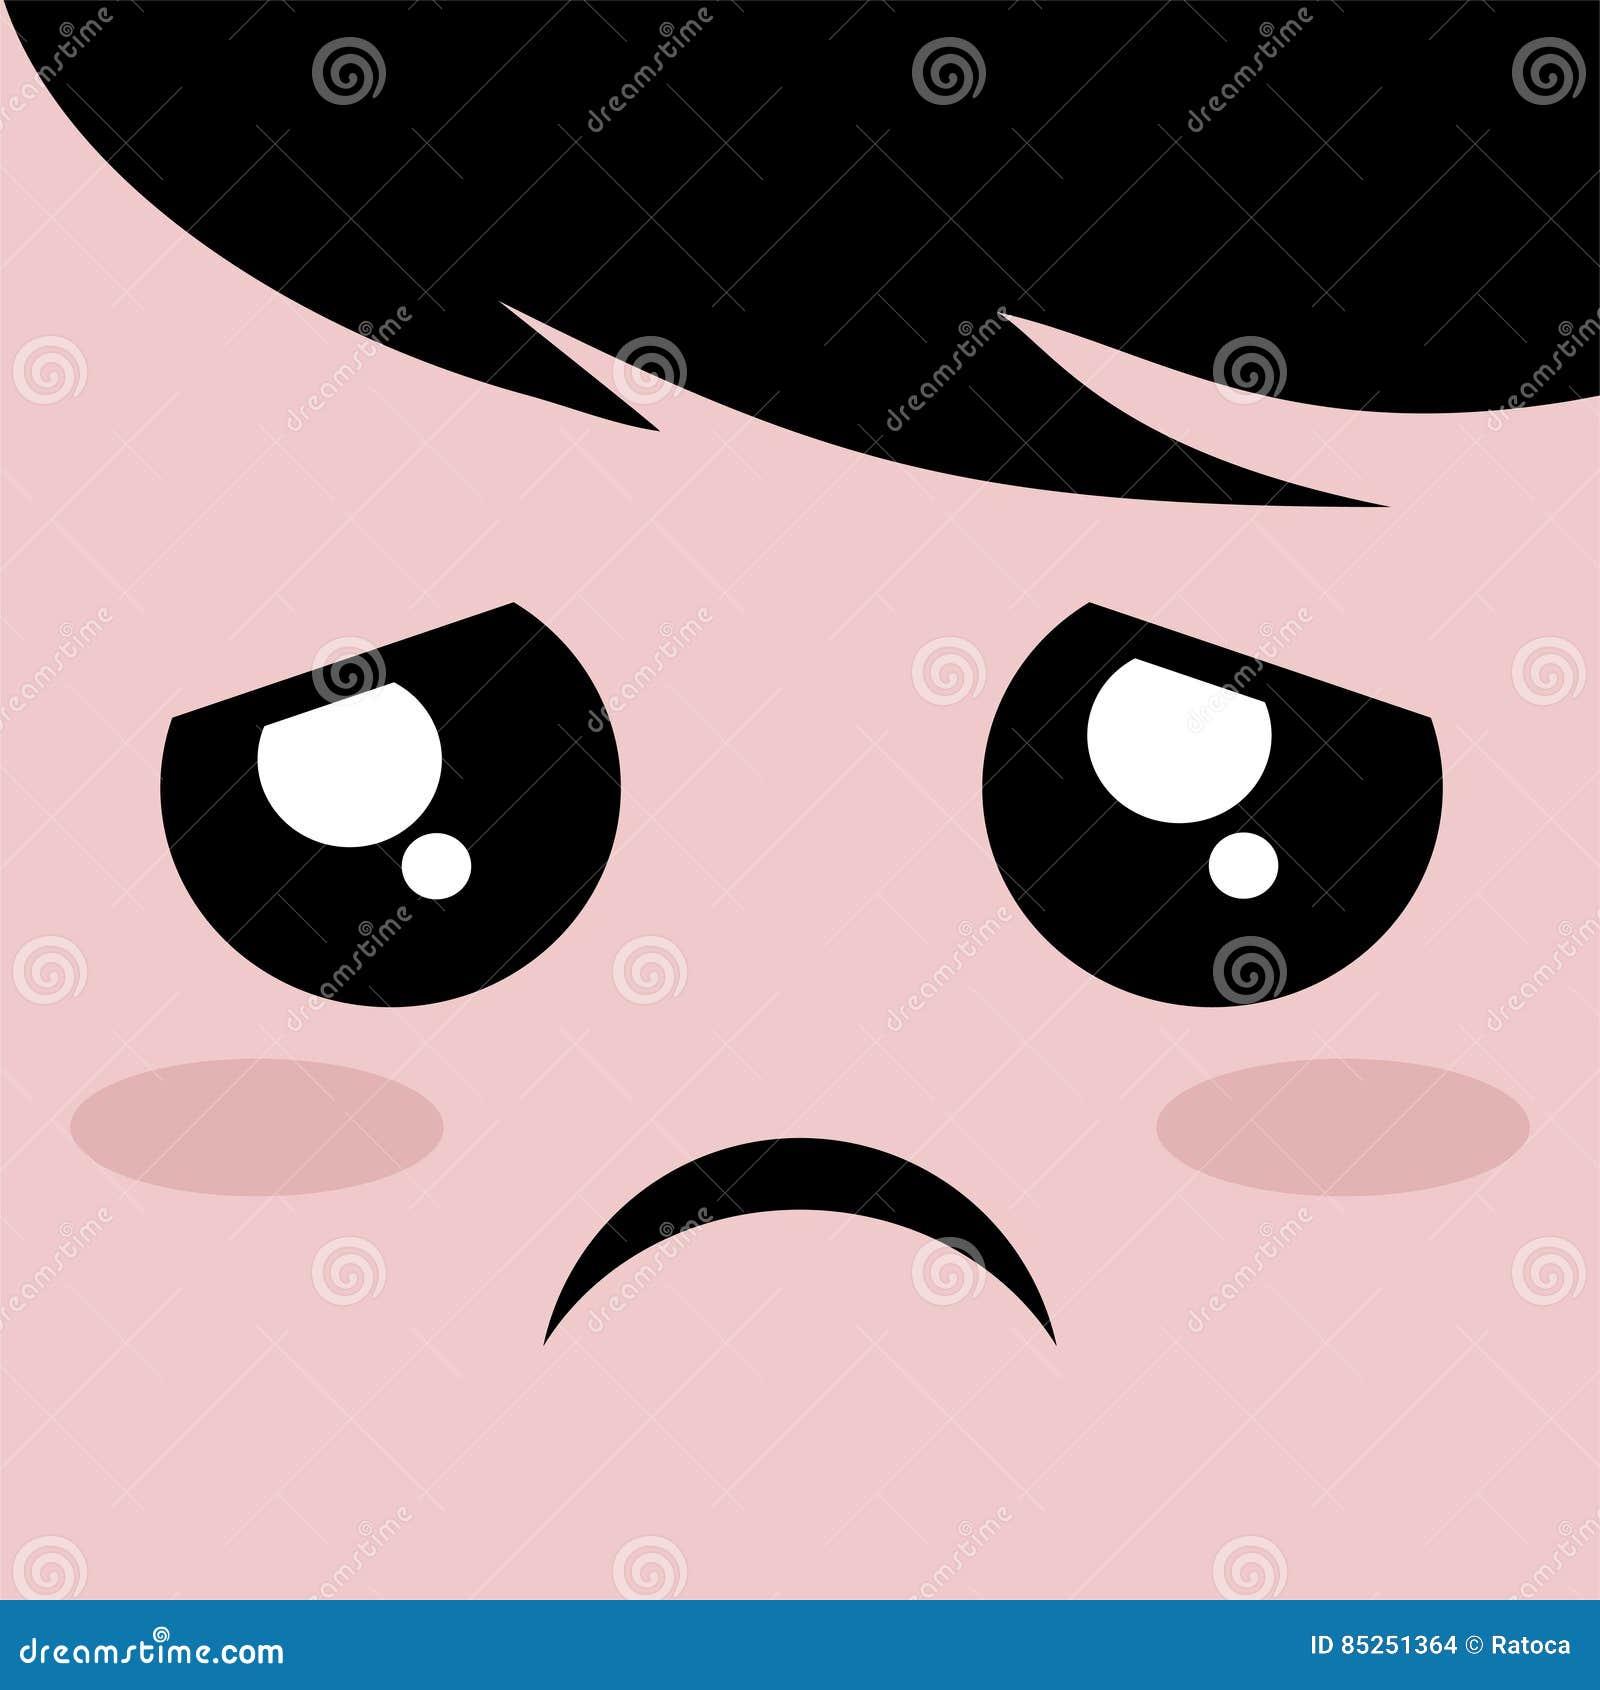 Sad Face Draw Stock Vector Illustration Of People Illustration